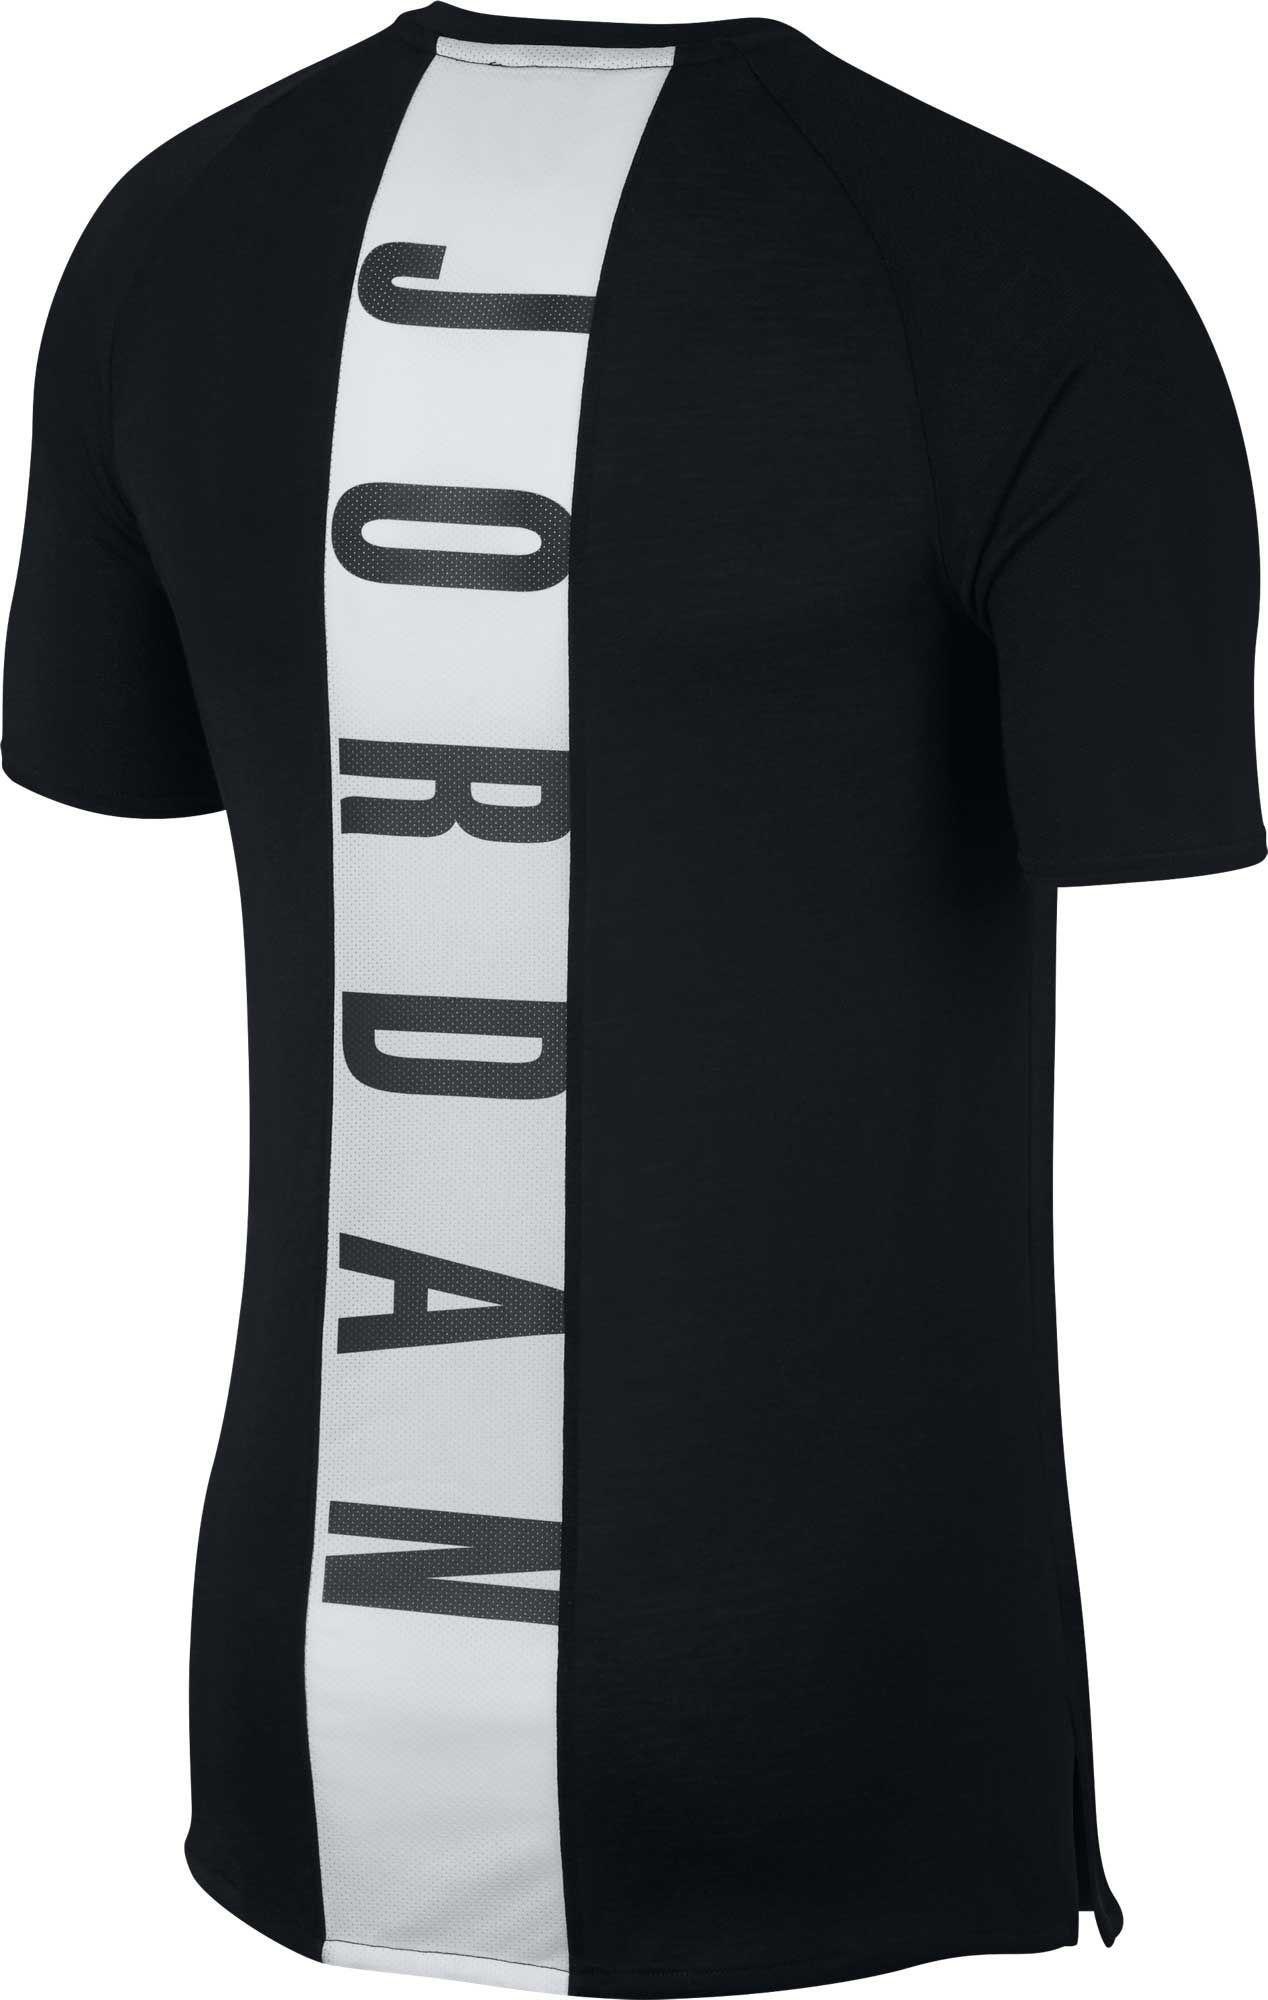 1ee4c8d5 Nike - Black Dry 23 Alpha Training T-shirt for Men - Lyst. View fullscreen